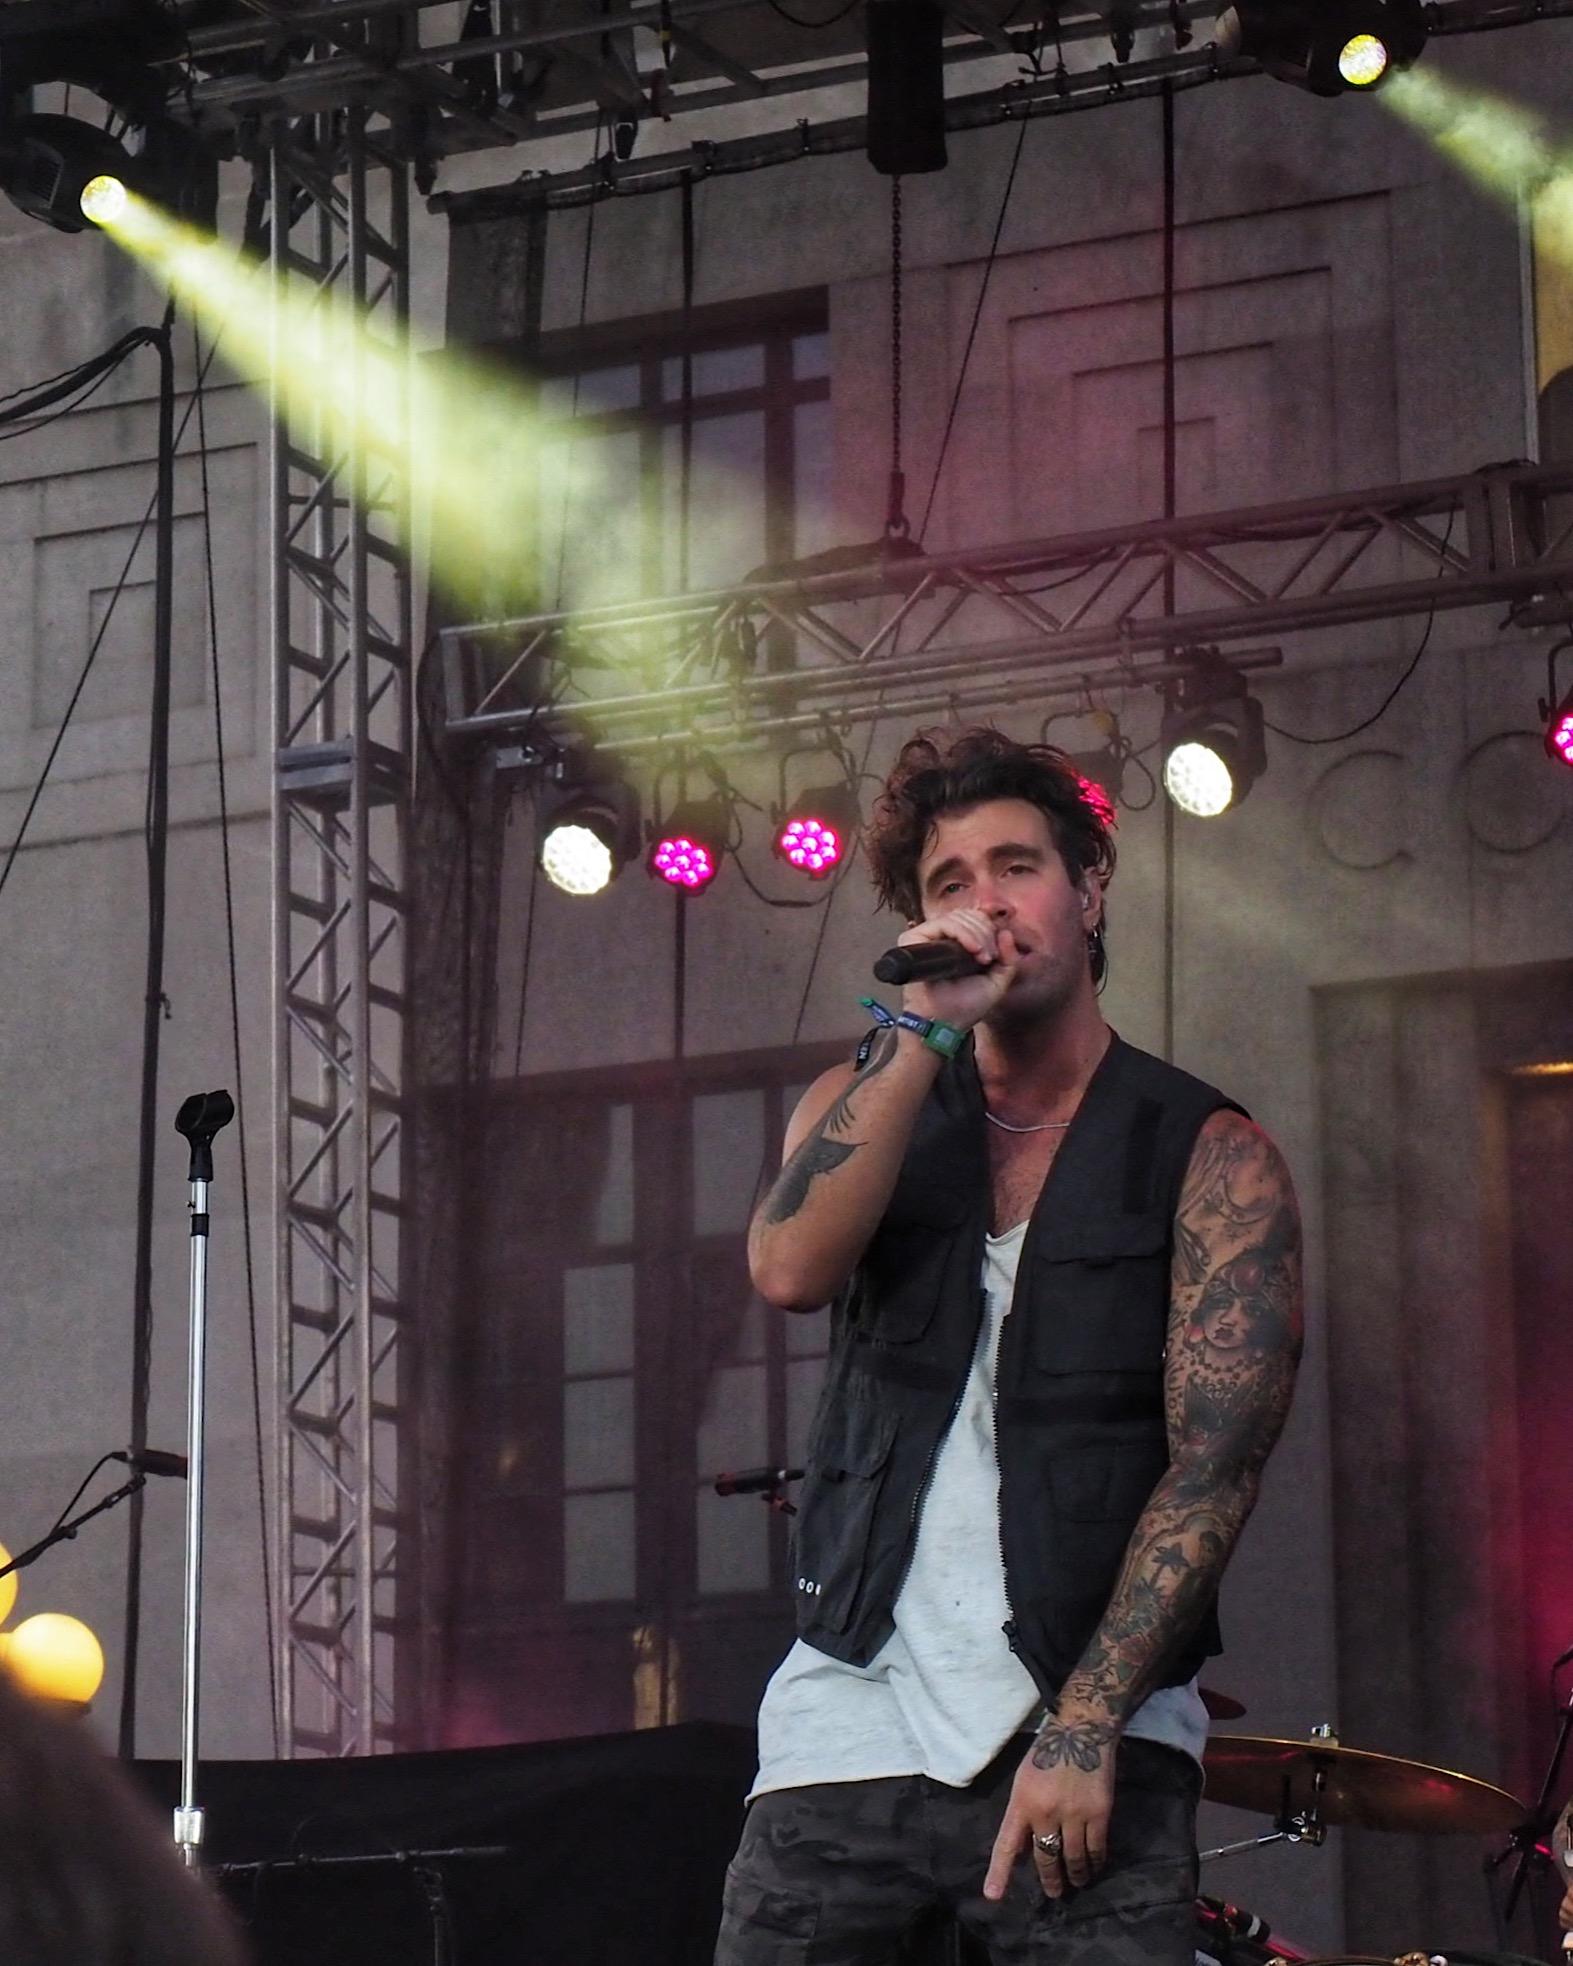 Zac Barnett performing at Live on the Green Music Festival.